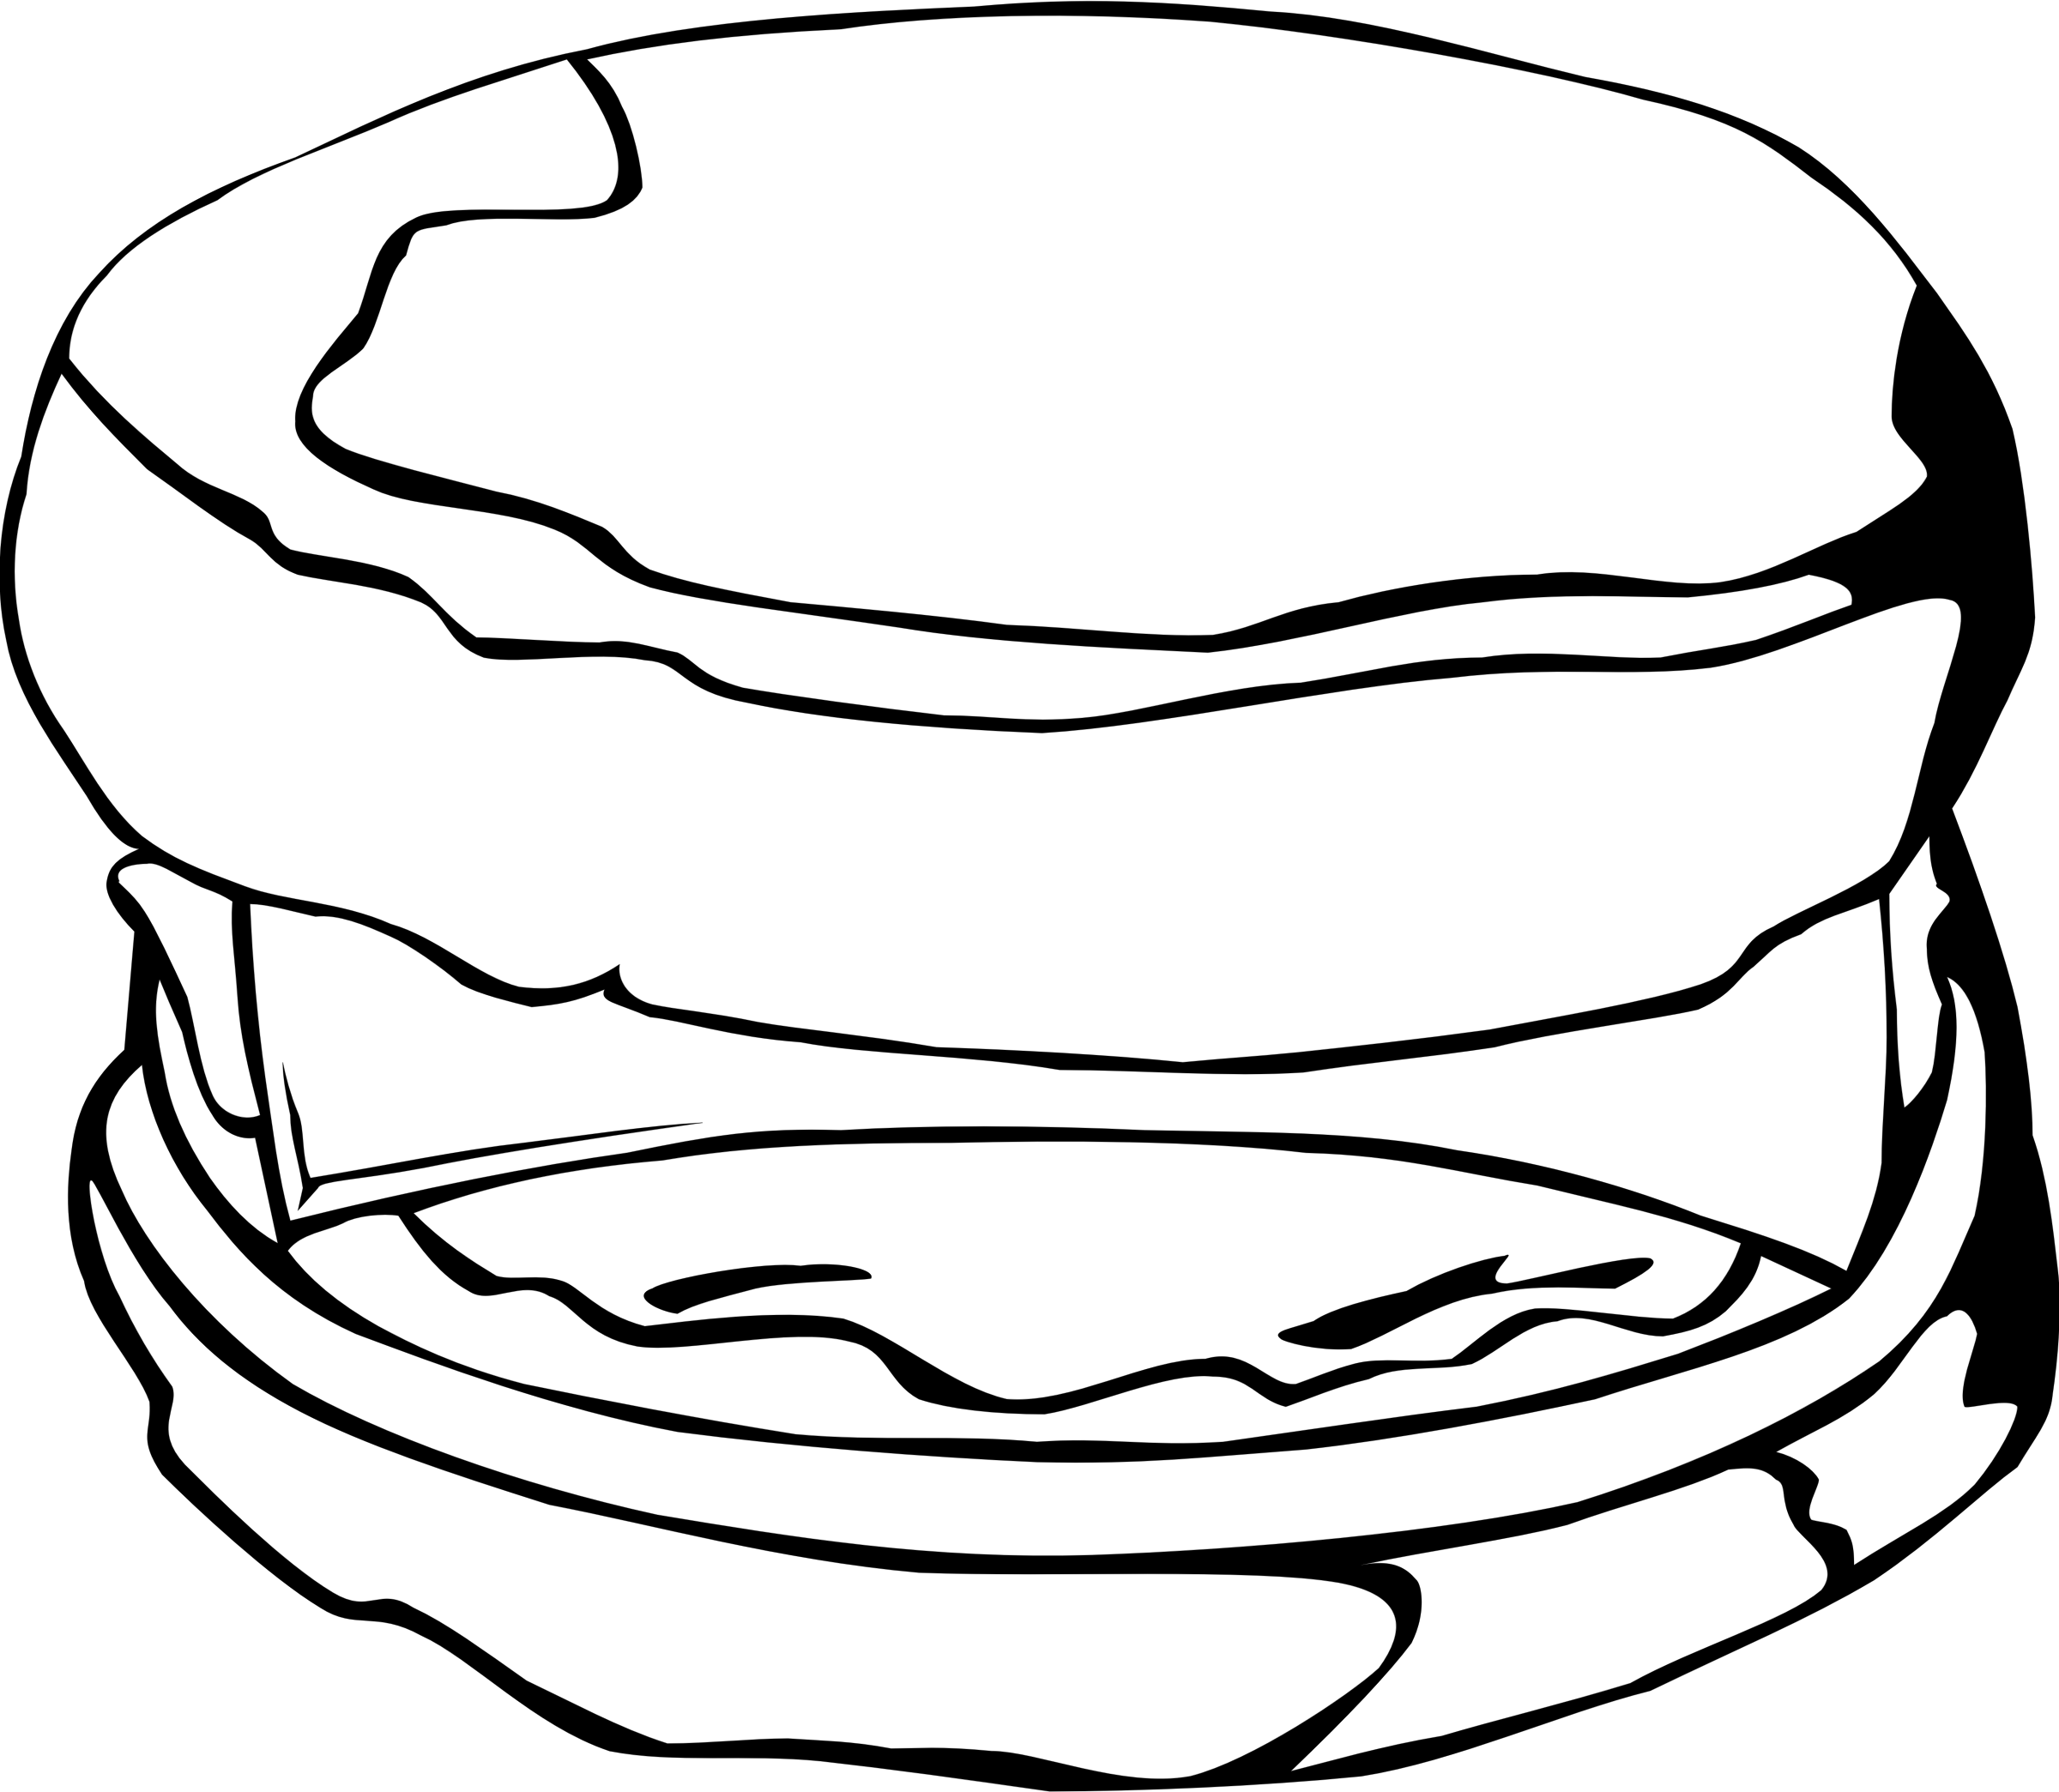 Fast food egg big. Muffin clipart breakfast muffin